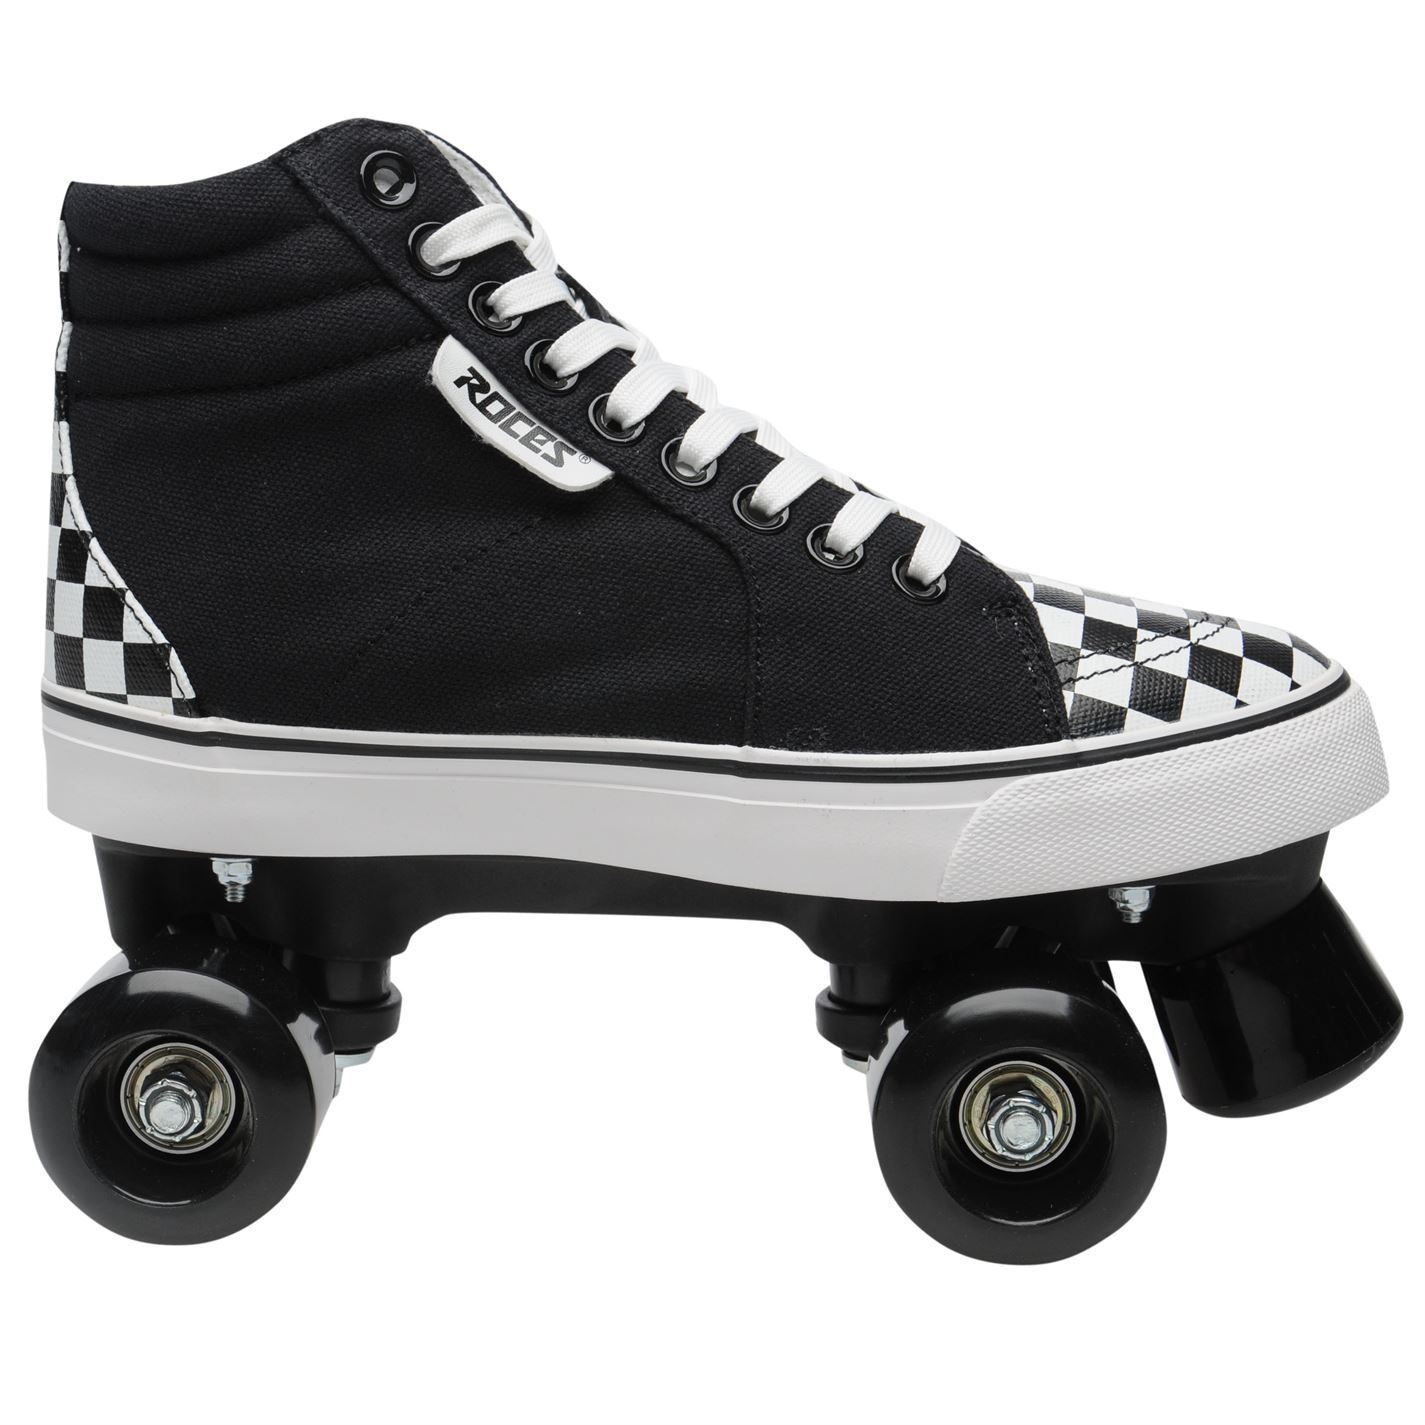 Herren Skates Quad Roces Ollie QuadSkt New New QuadSkt a3953c